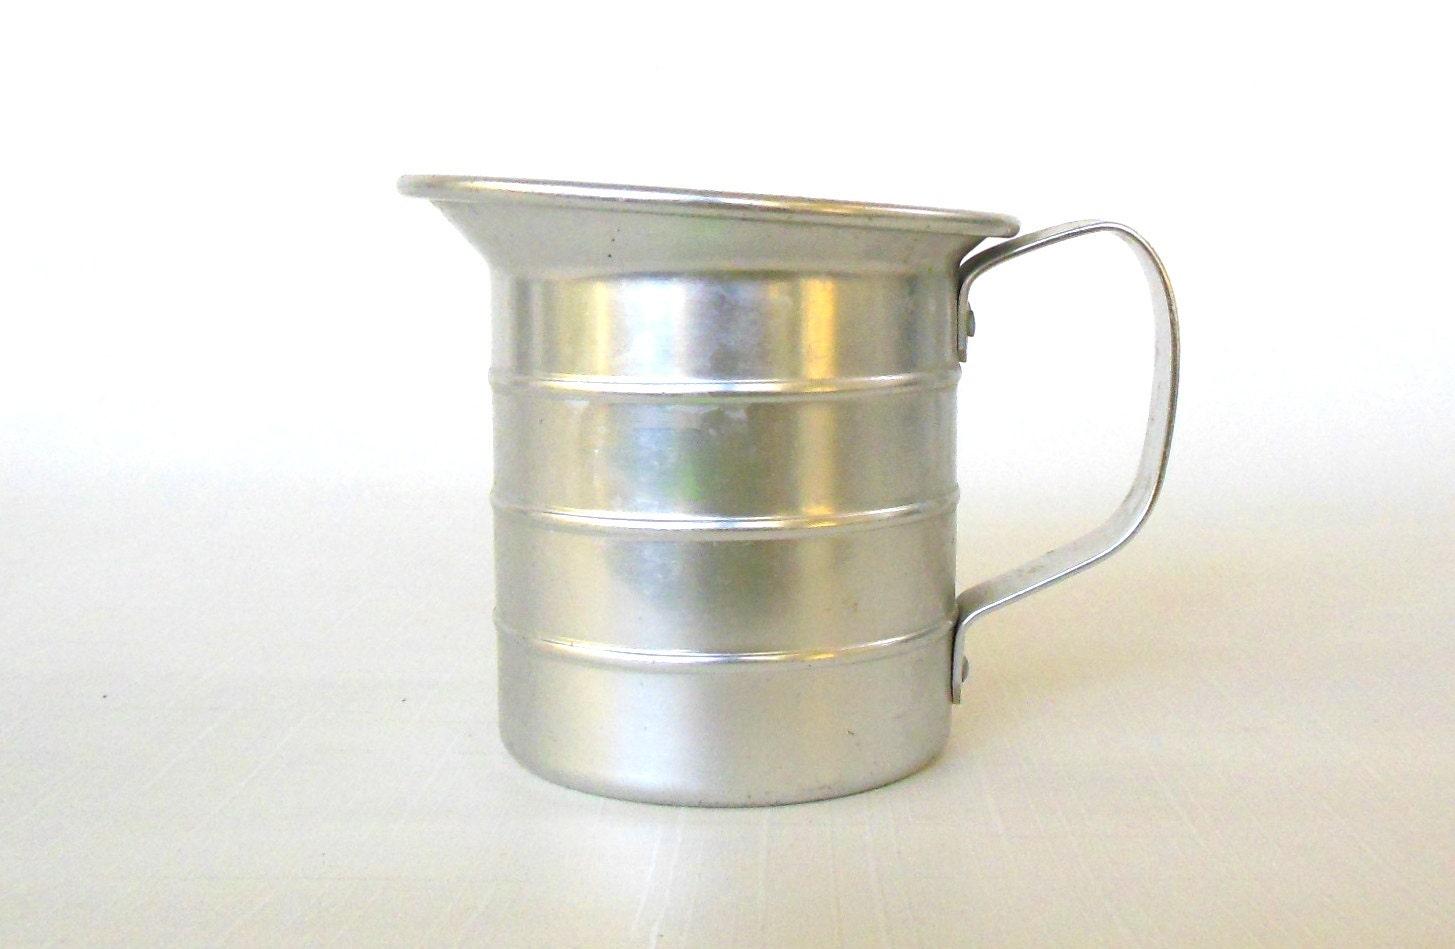 Measuring Cup 2 Cups Wearever Aluminum 5260 1 2 Tacuco